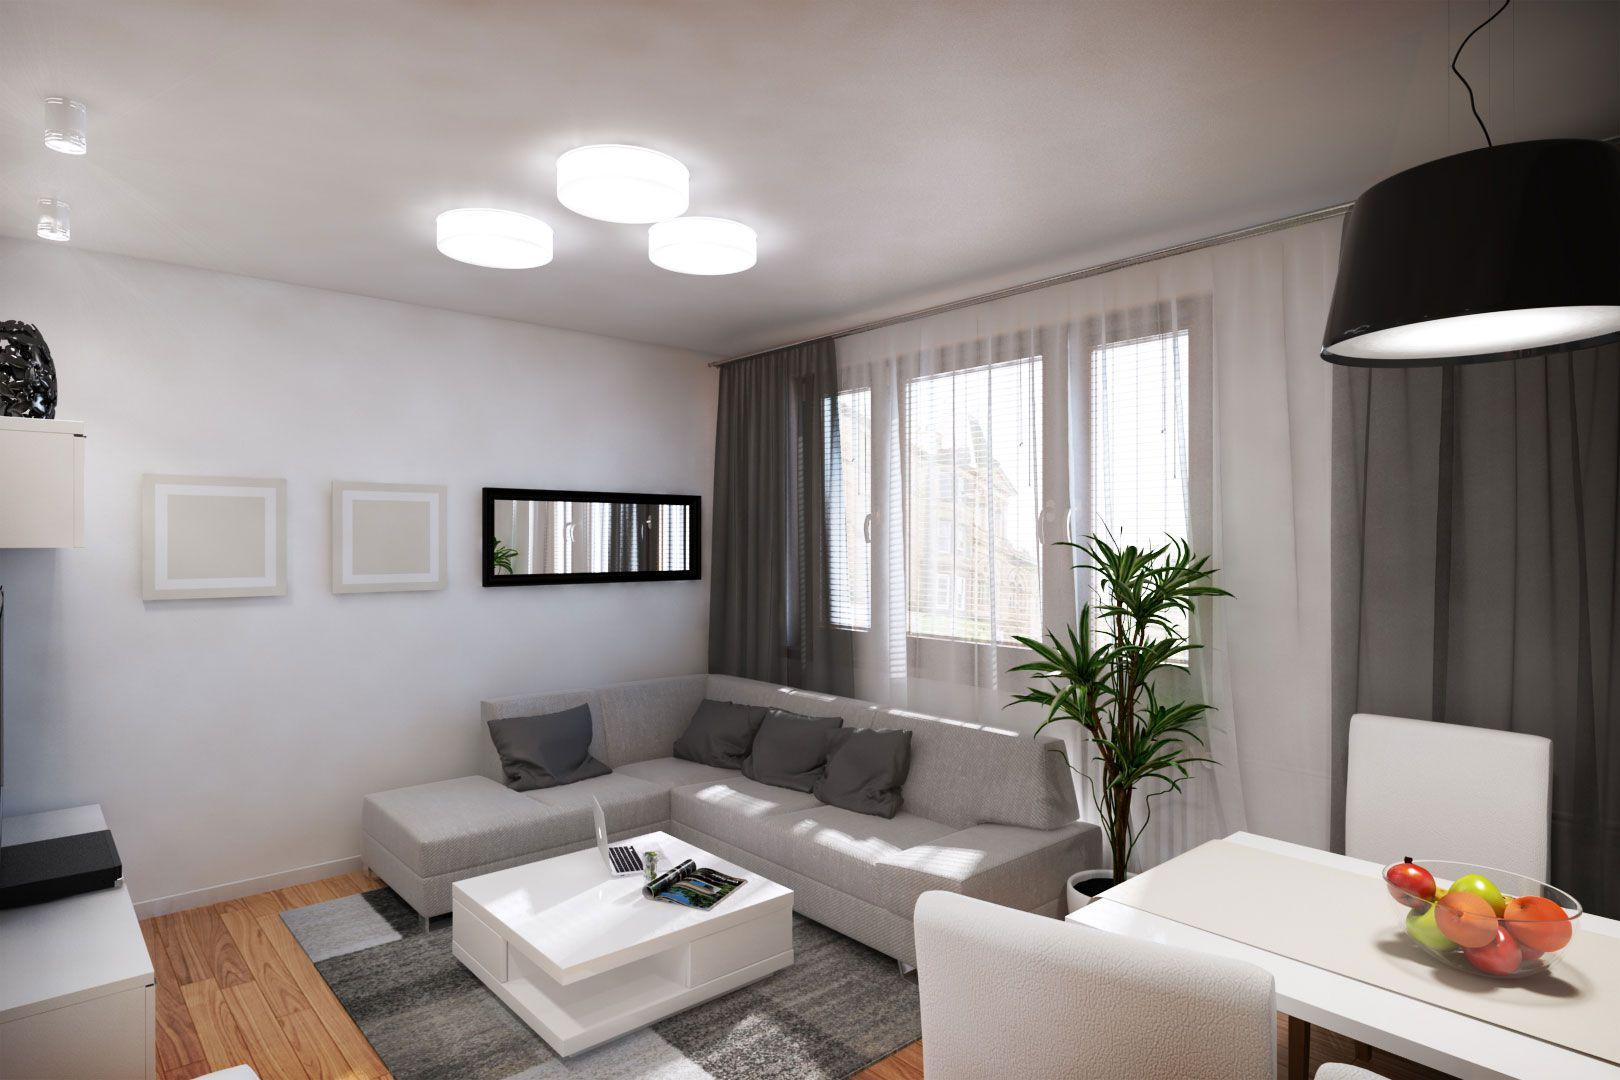 Interior r by 110 studio caandesign architecture and for Muebles departamento pequeno